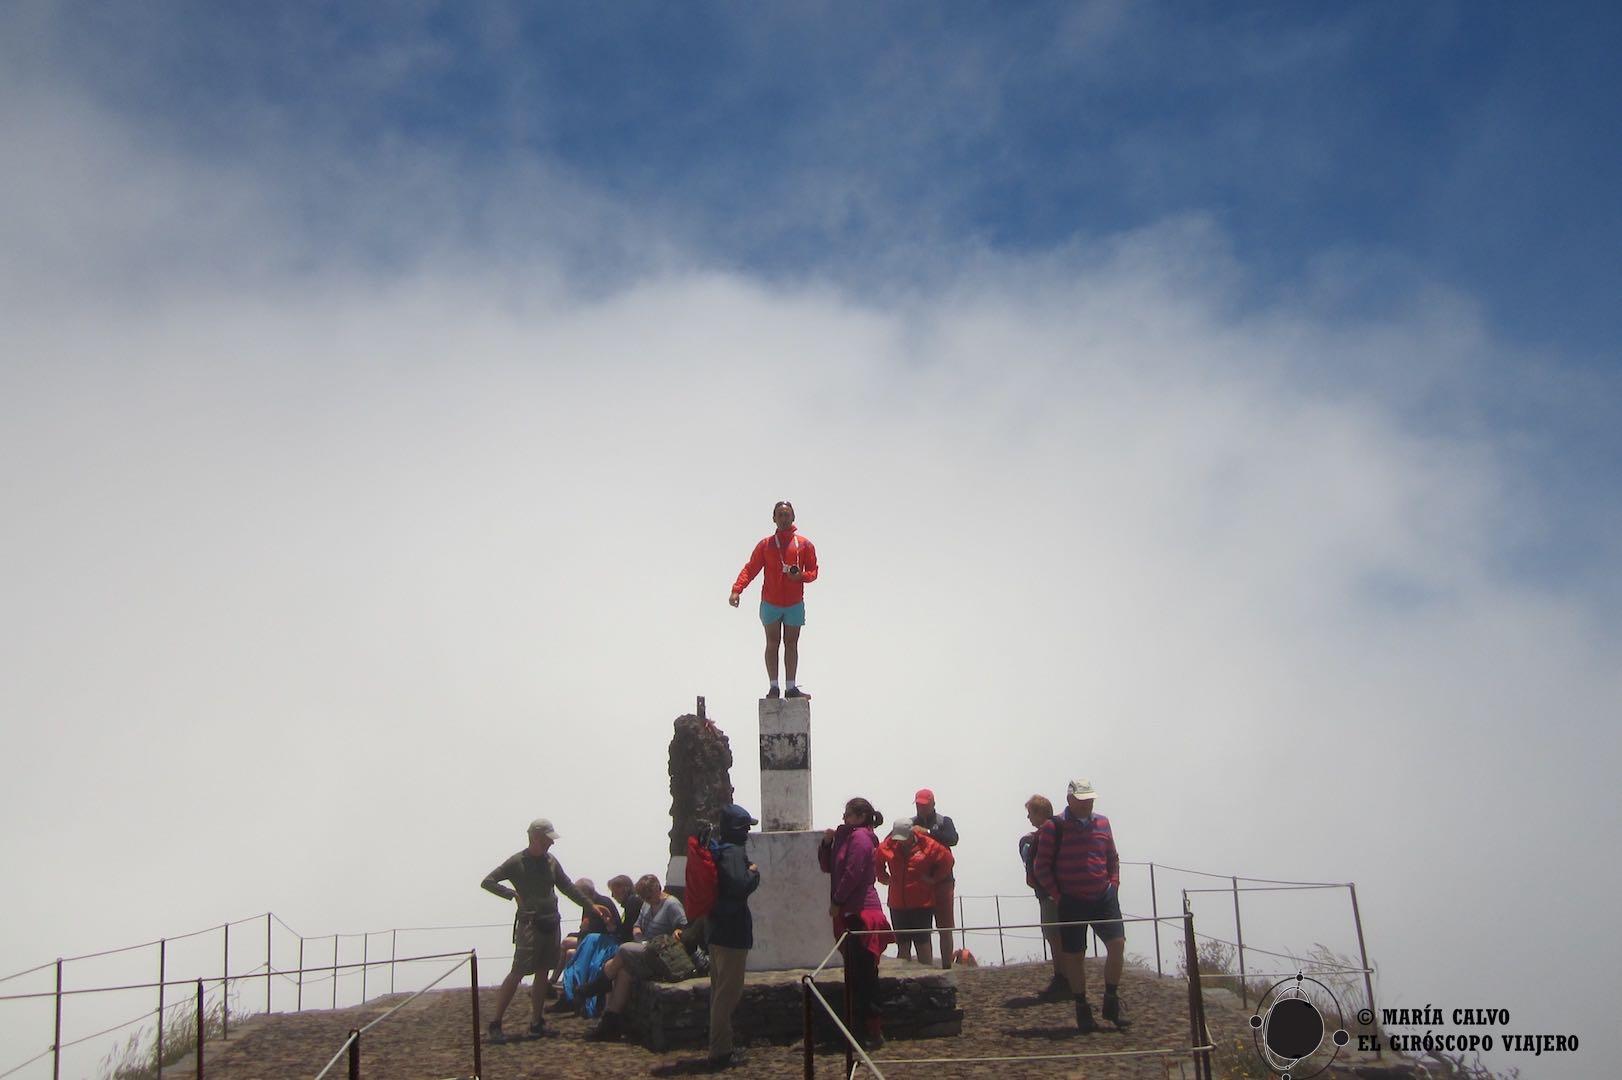 Hoy no podemos ver las panorámicas desde Pico Ruivo, la cima de Madeira